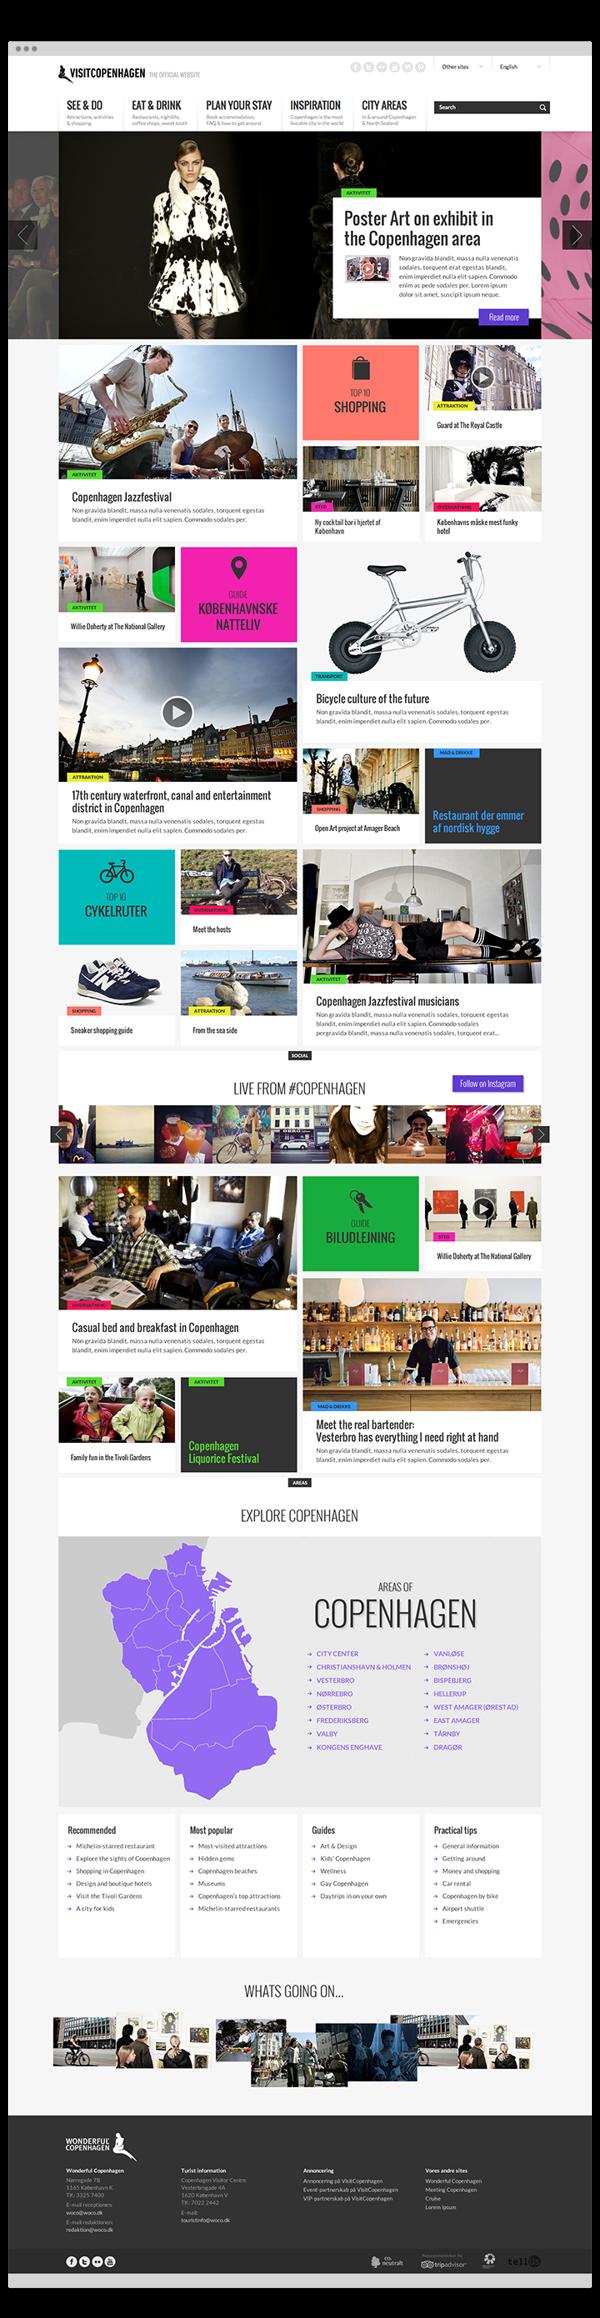 Visitcopenhagen Com By Jesper Winther Via Behance Veb Dizajn Dizajn Idei